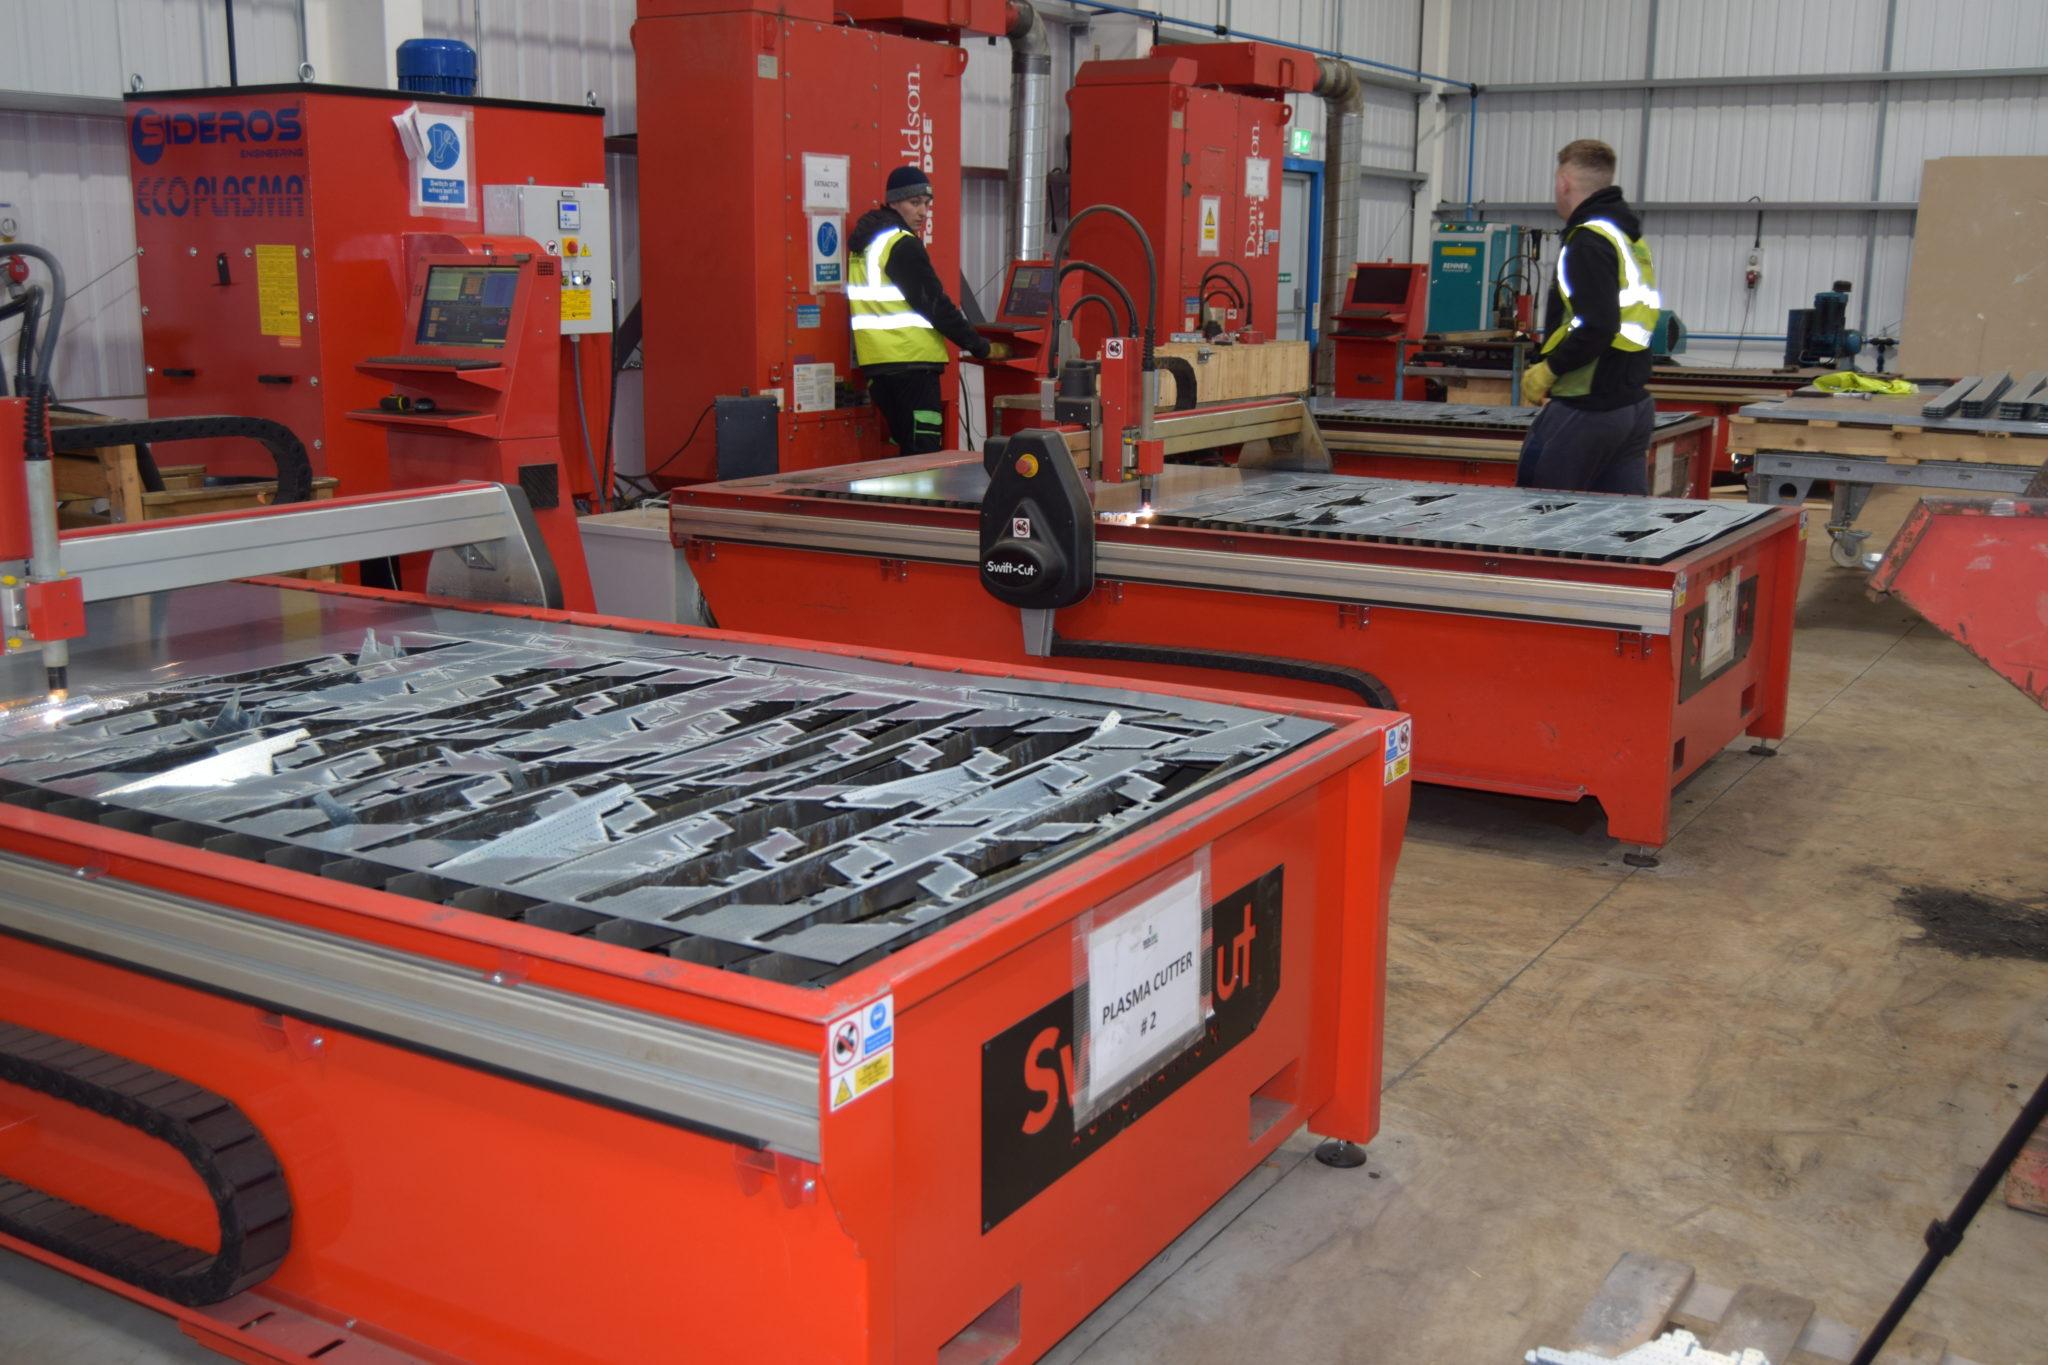 Swift-Cut Pro CNC plasma cutting table